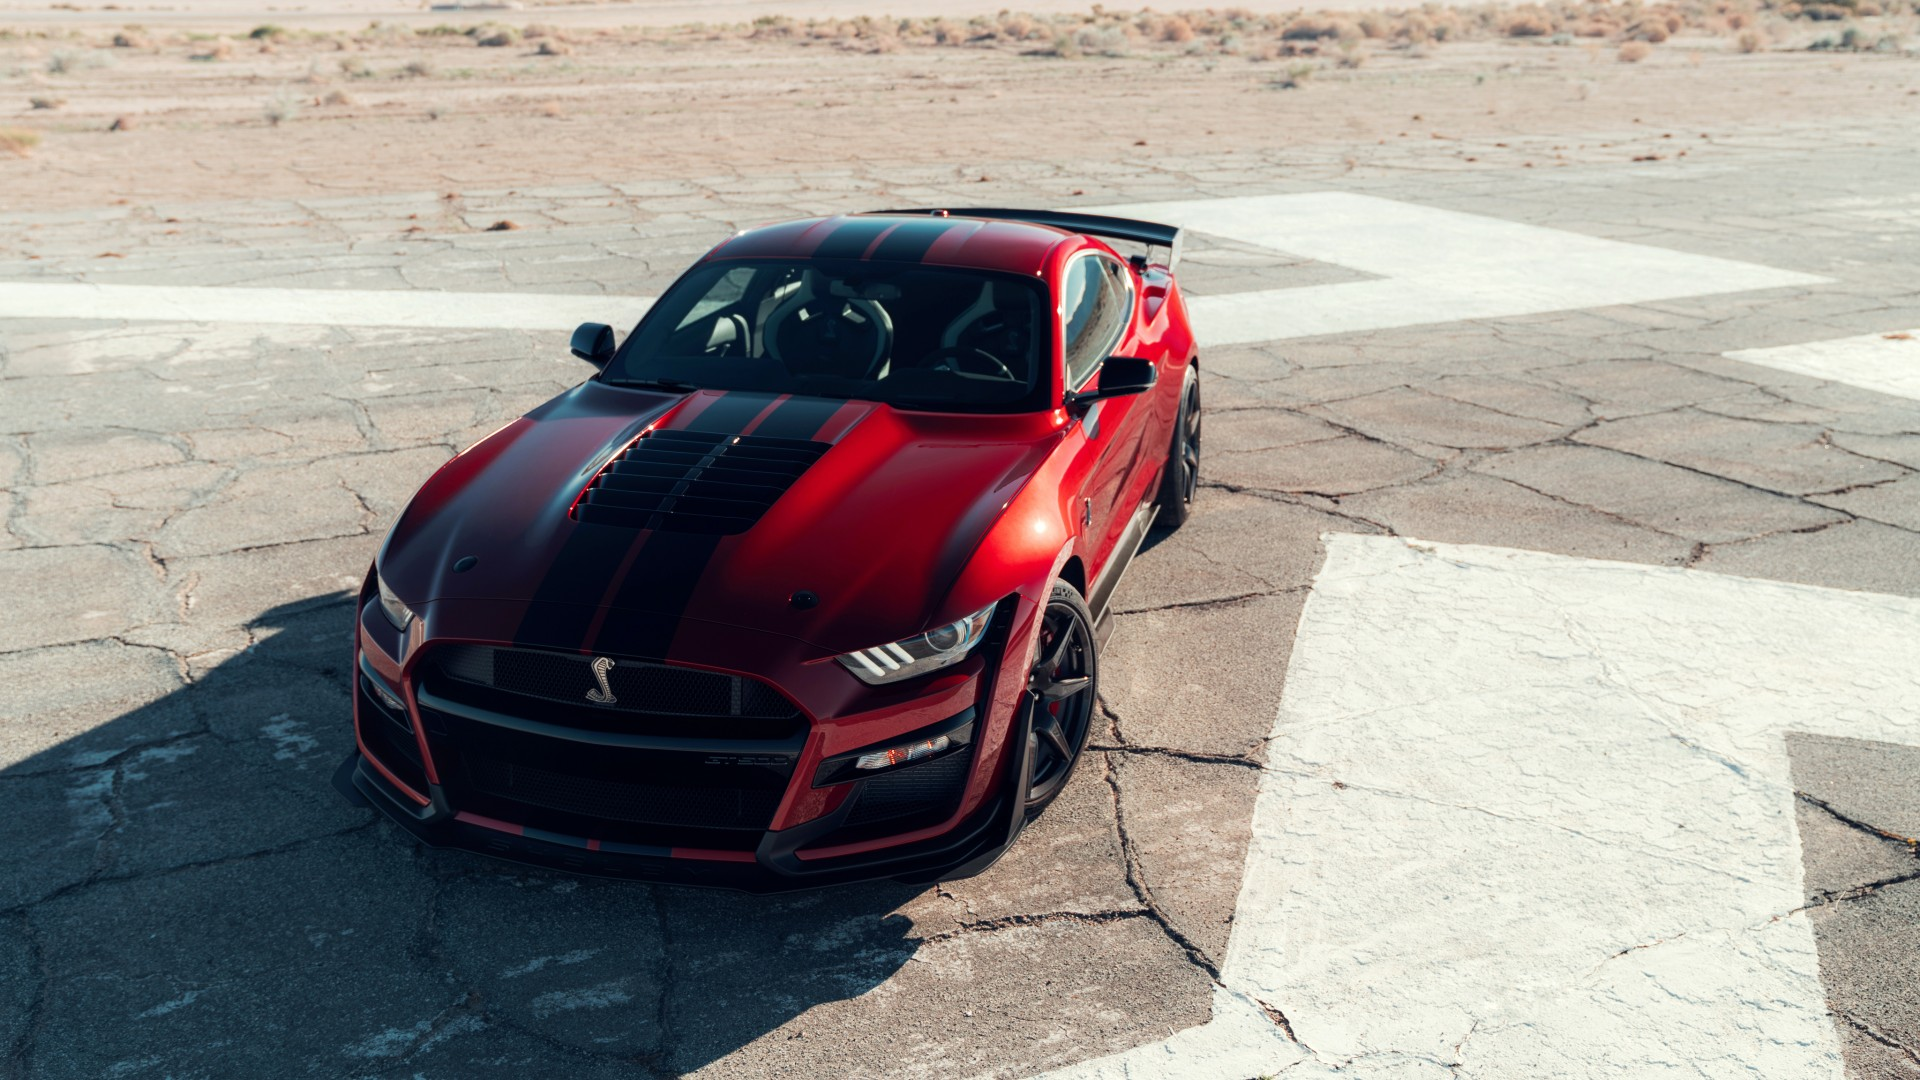 2020 Ford Mustang Shelby Gt500 4k 4 Wallpaper Hd Car